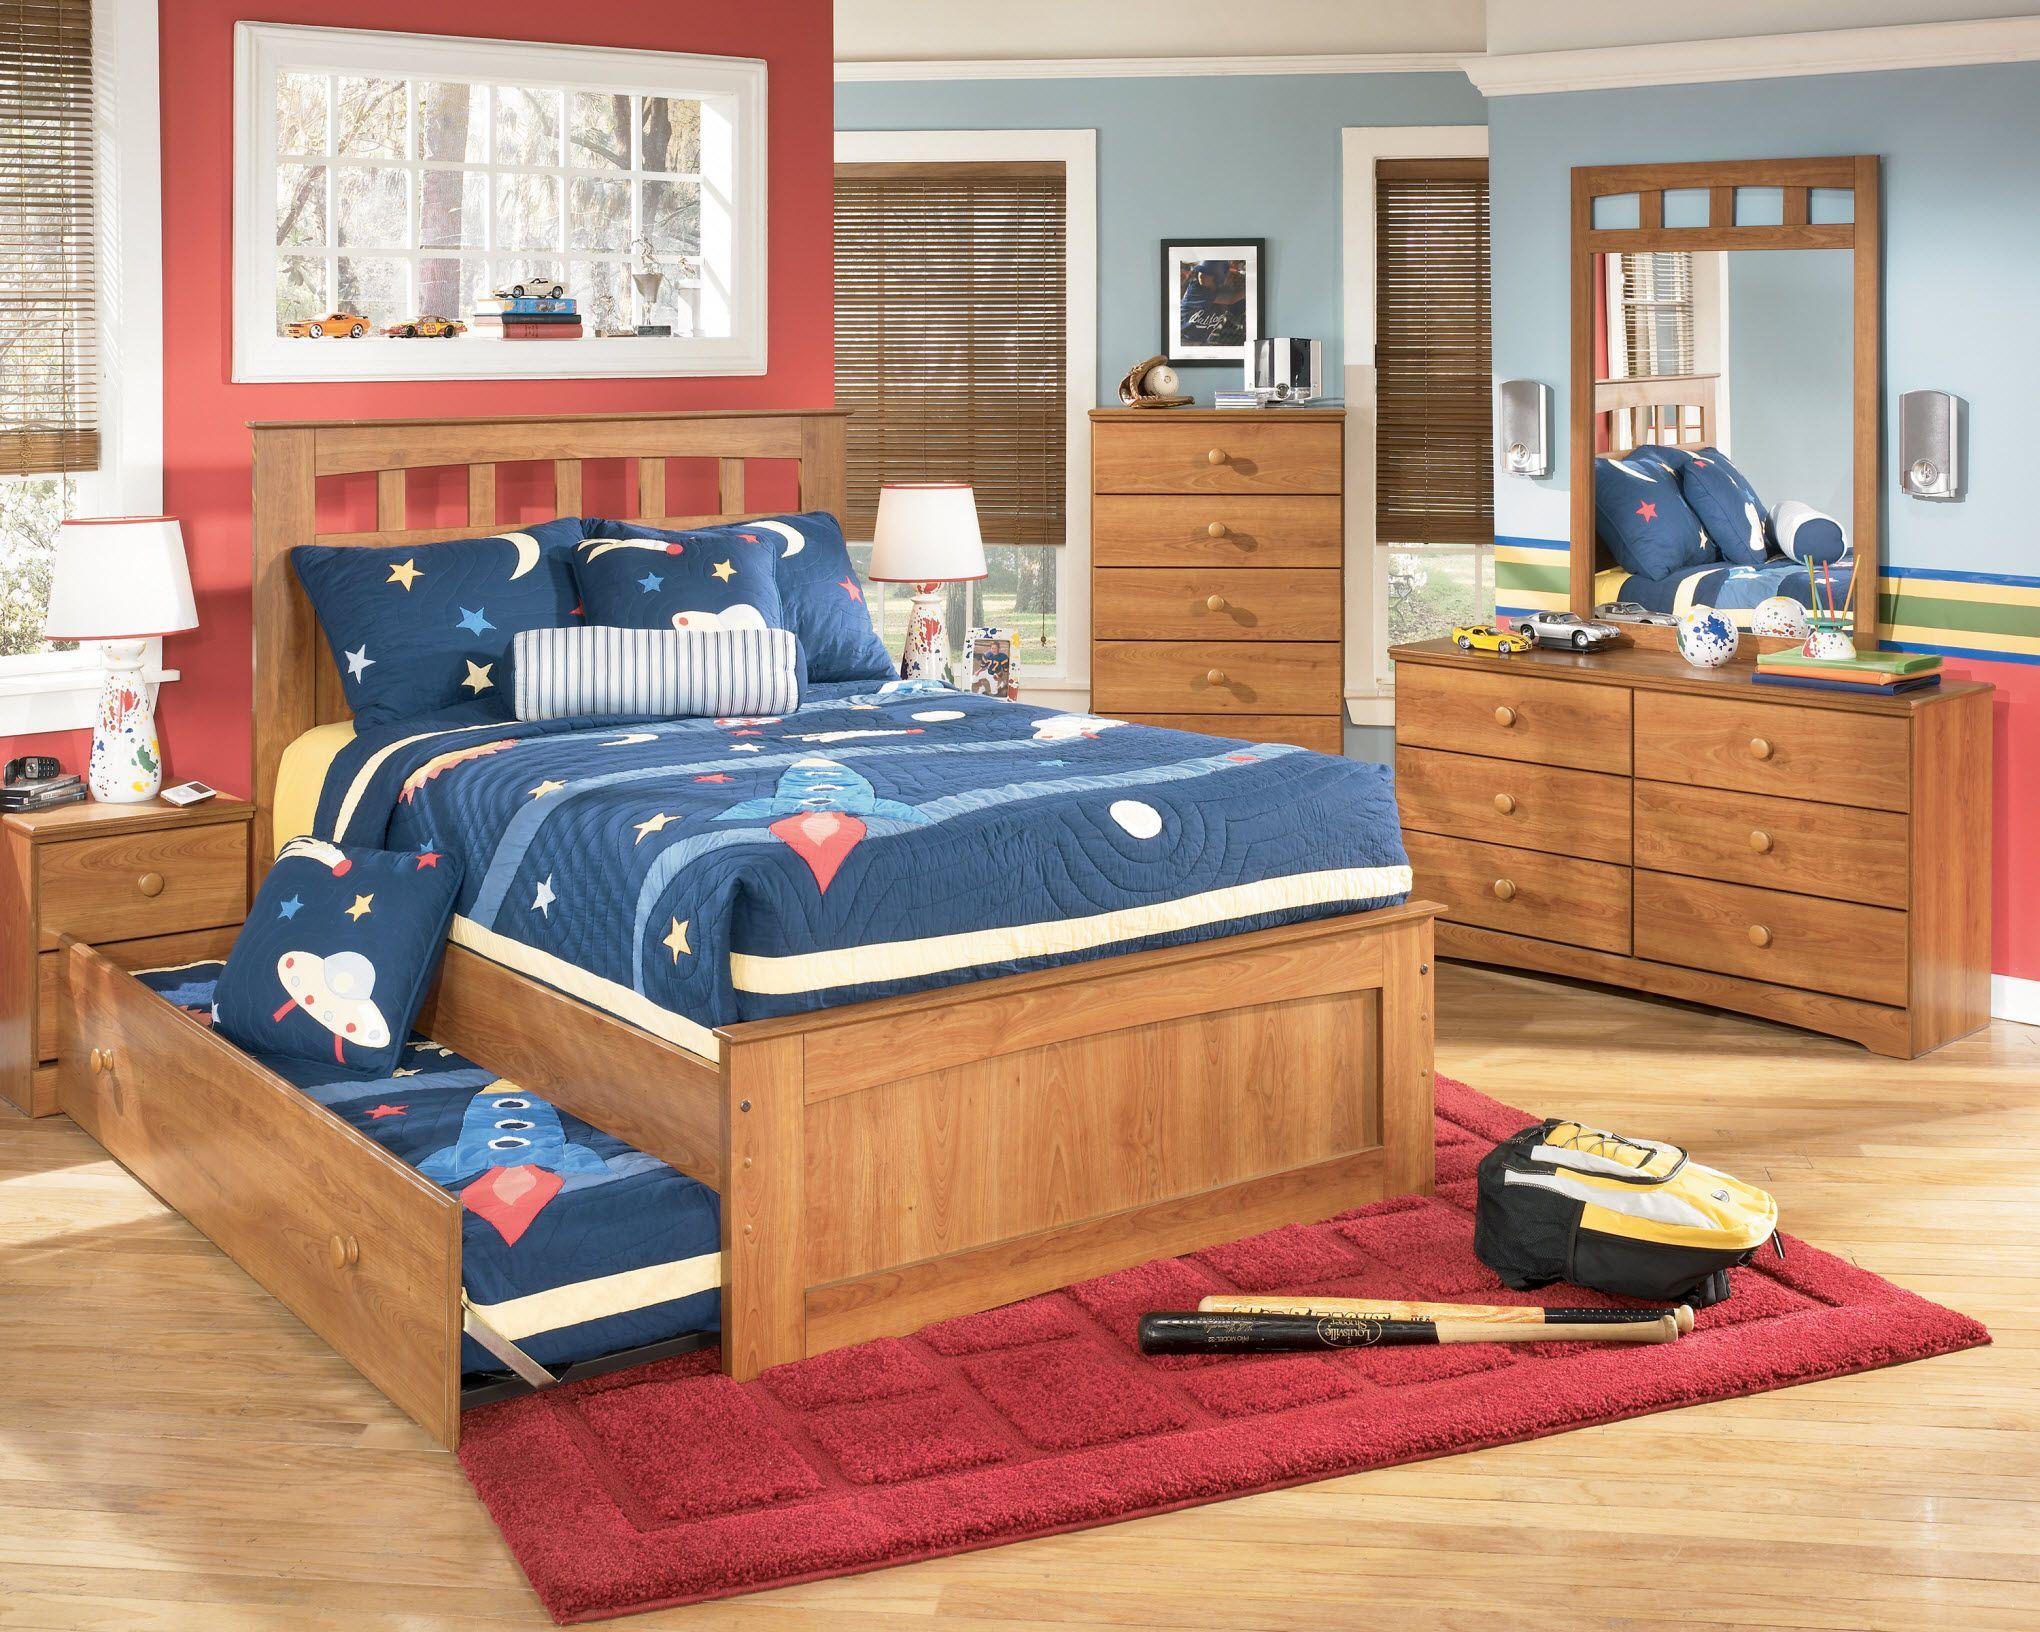 Pick Up The Best Boys Bedroom Furniture In 2020 Kids Bedroom